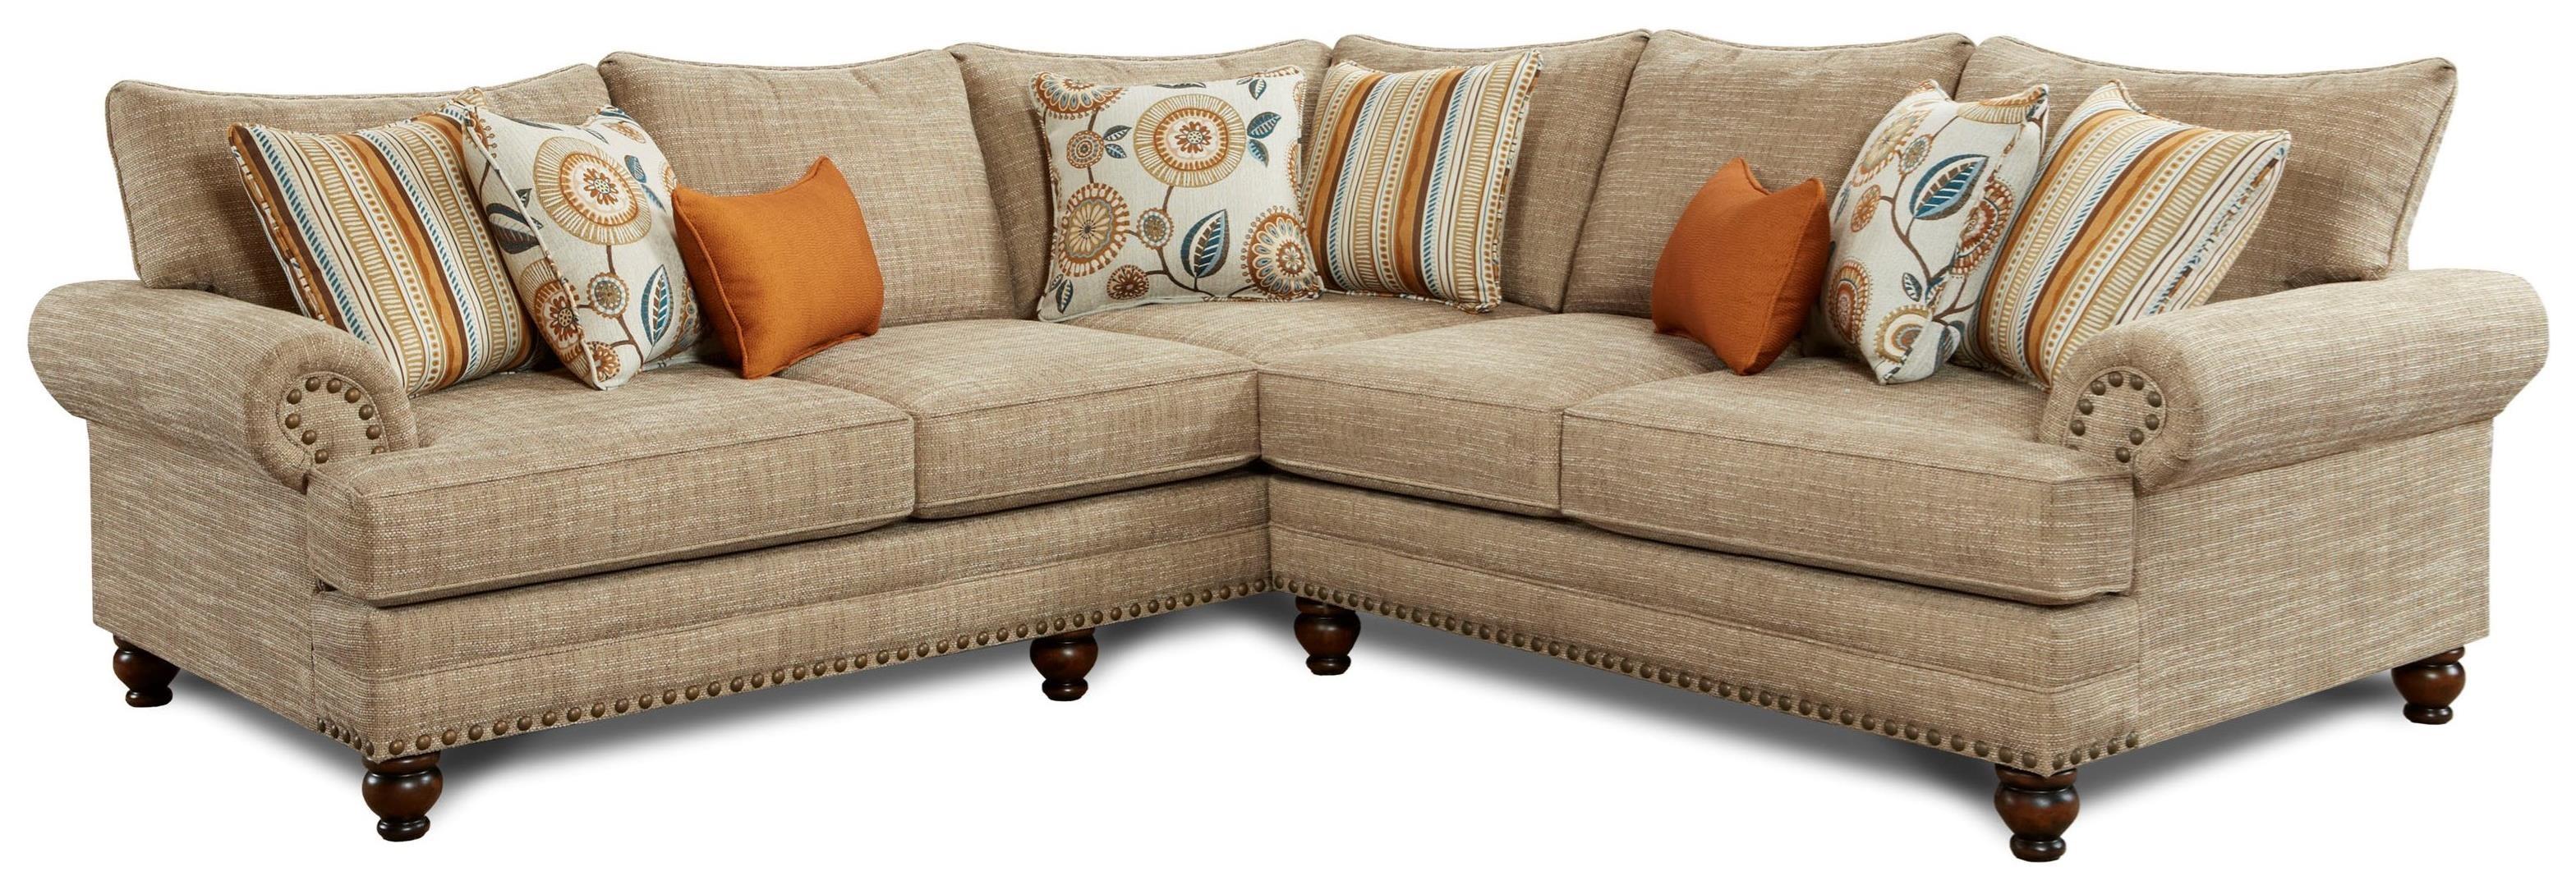 oatmeal sofa set in sm philippines fiera ashley furniture home thesofa